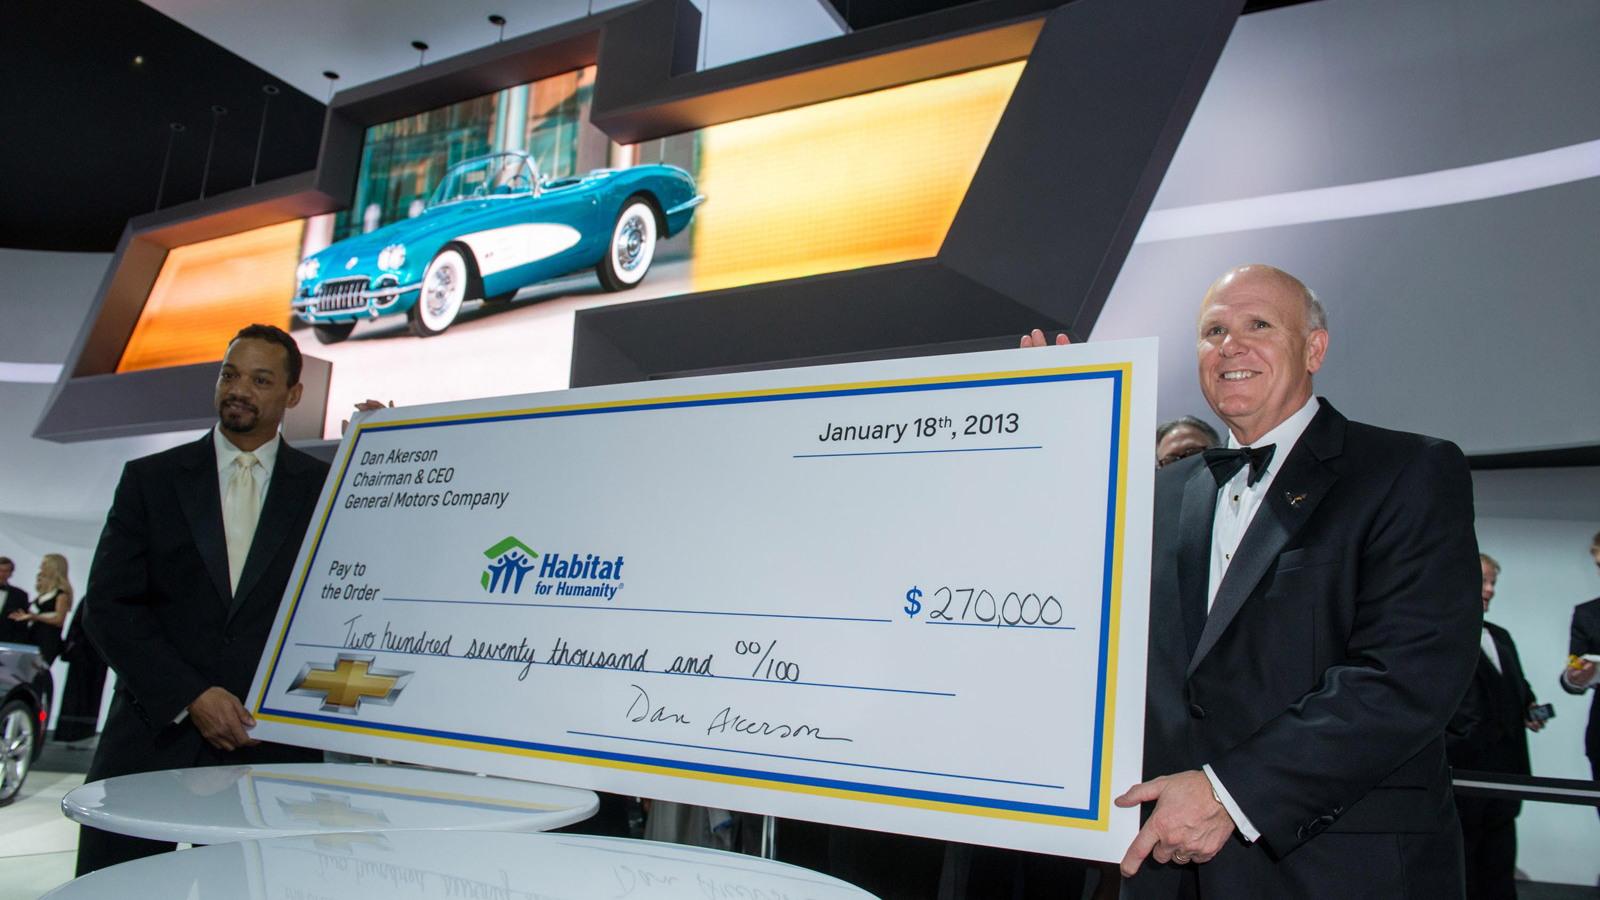 GM CEO Dan Akerson following the auction of his 1958 Chevrolet Corvette